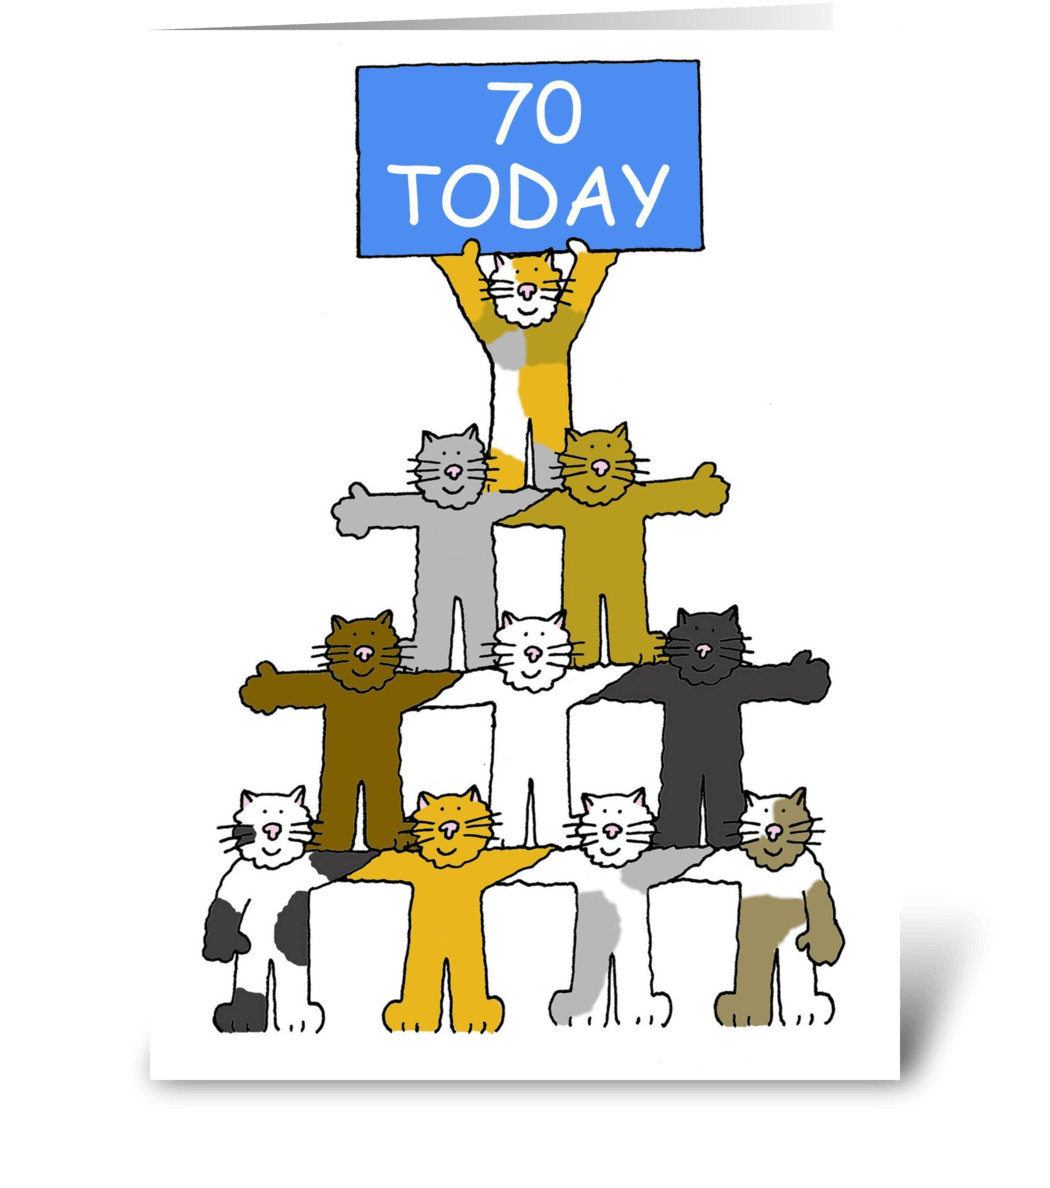 Happy 70th Birthday Fun Cats